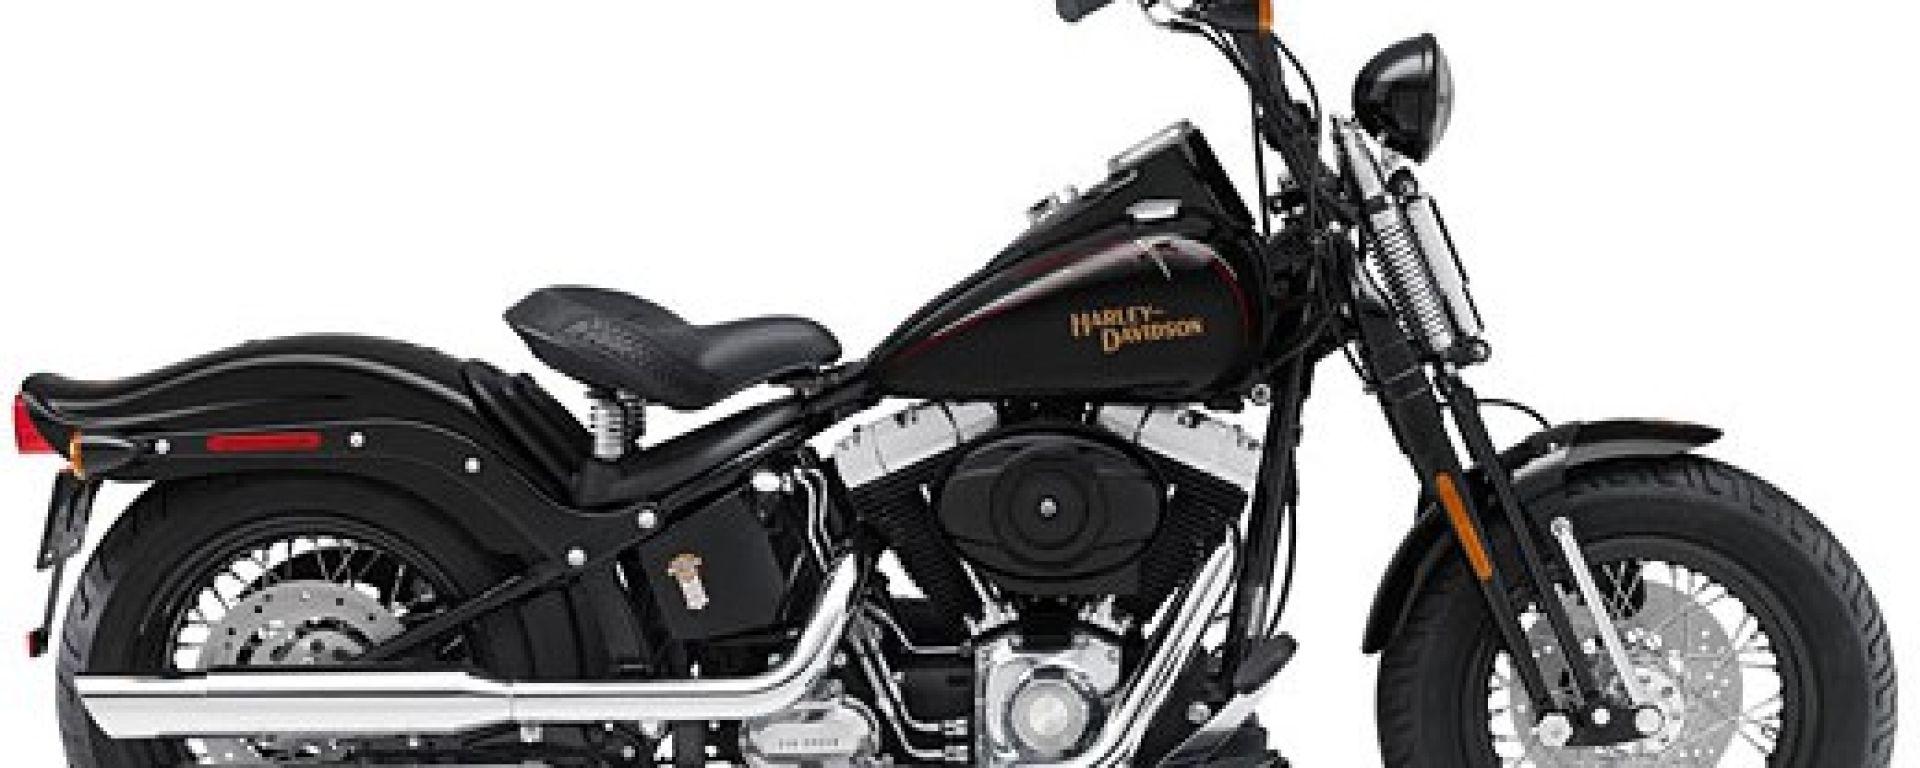 Harley Davidson FLSTSB Softail Cross Bones